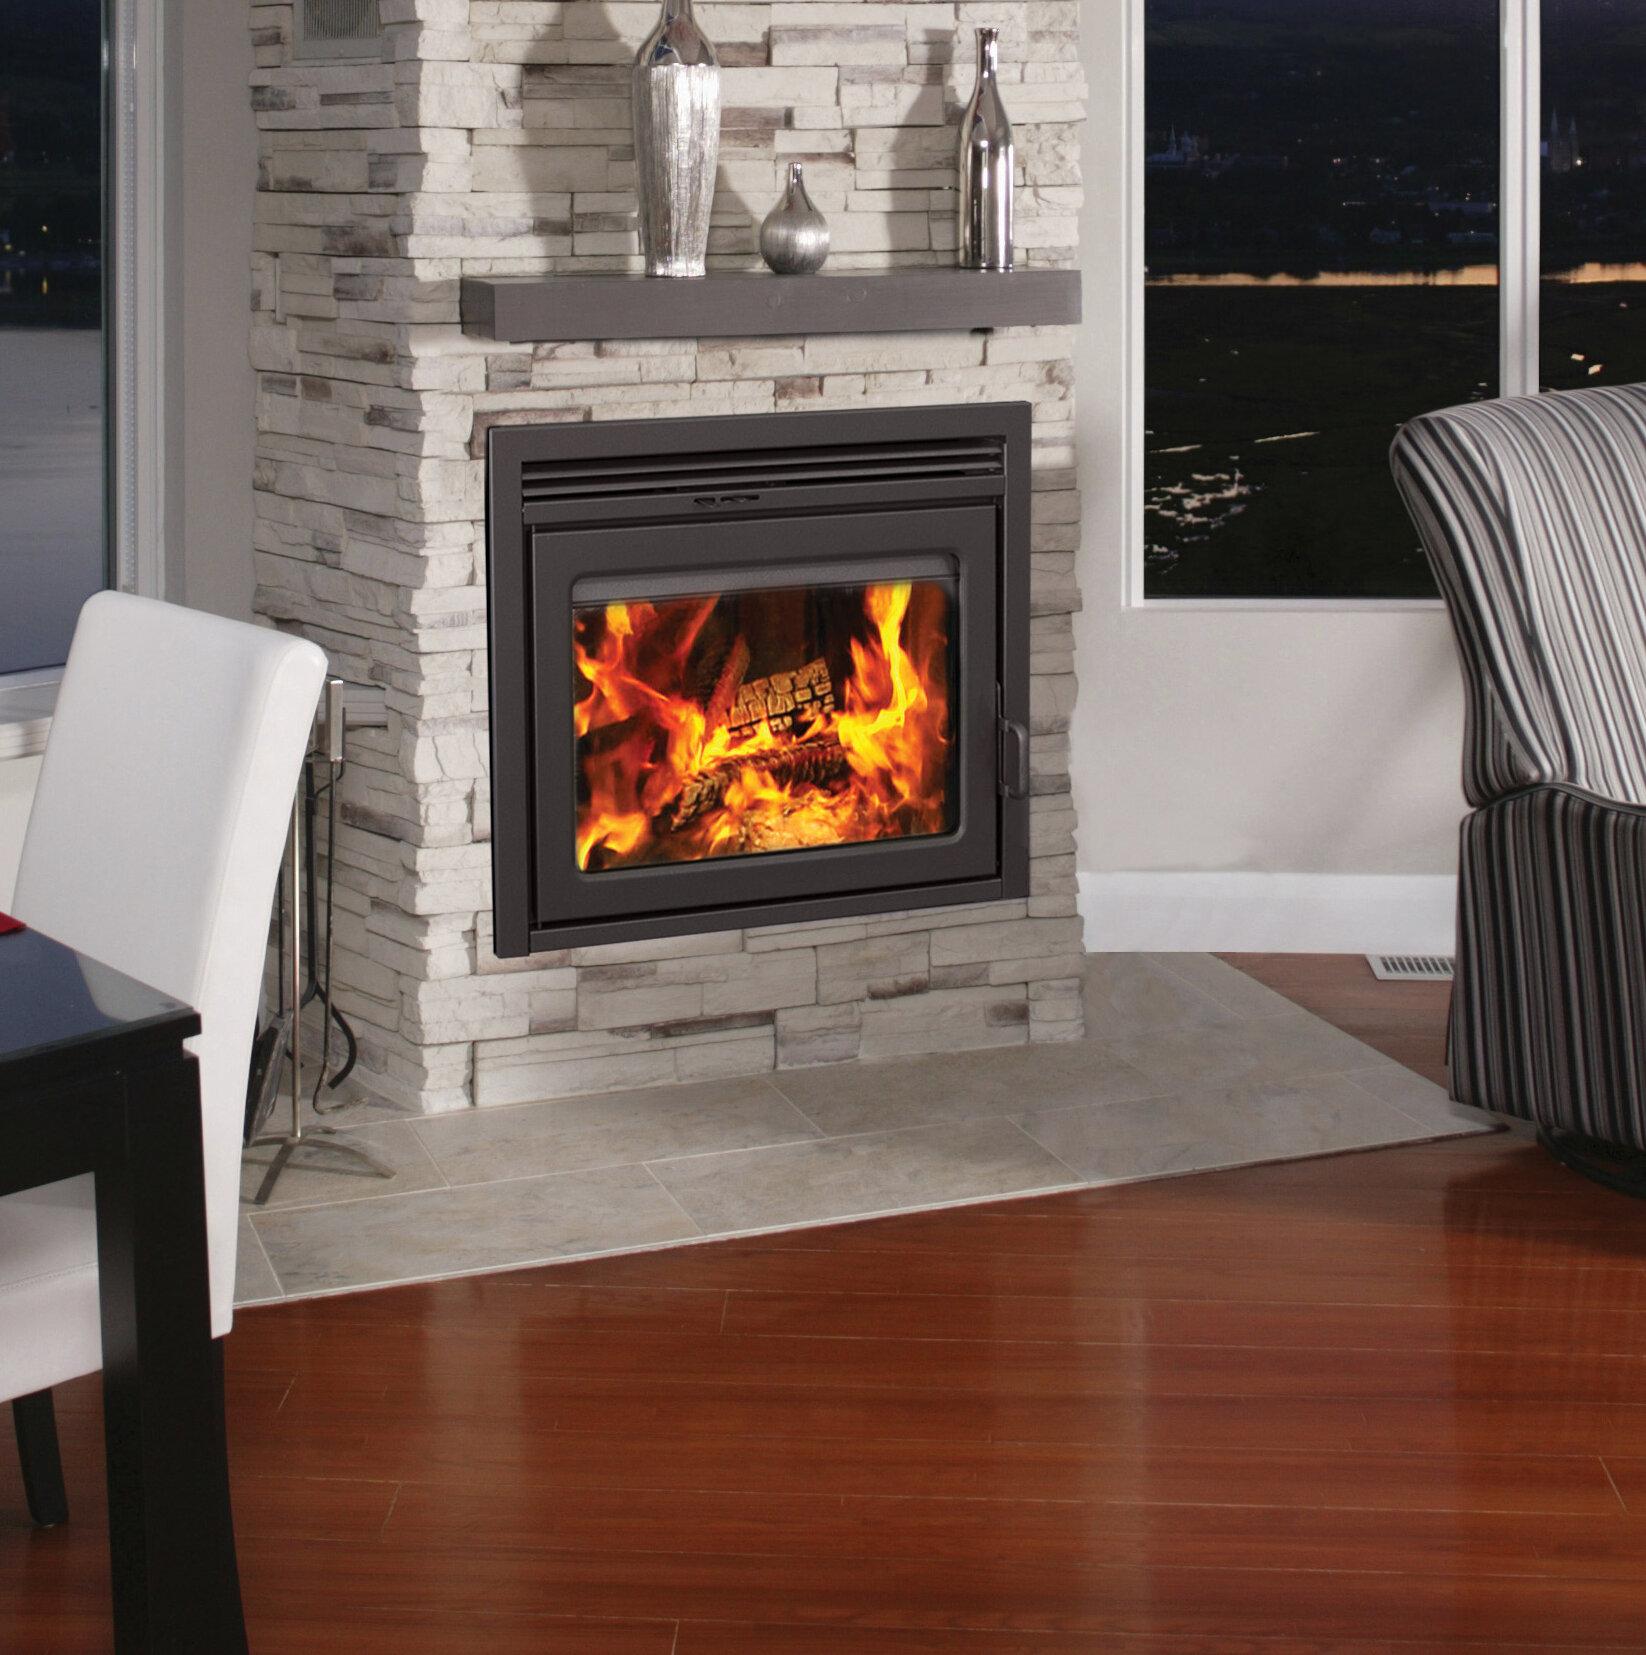 Tremendous Supreme Fireplaces Inc Galaxy Fireplace Insert Wayfair Ca Interior Design Ideas Gentotryabchikinfo